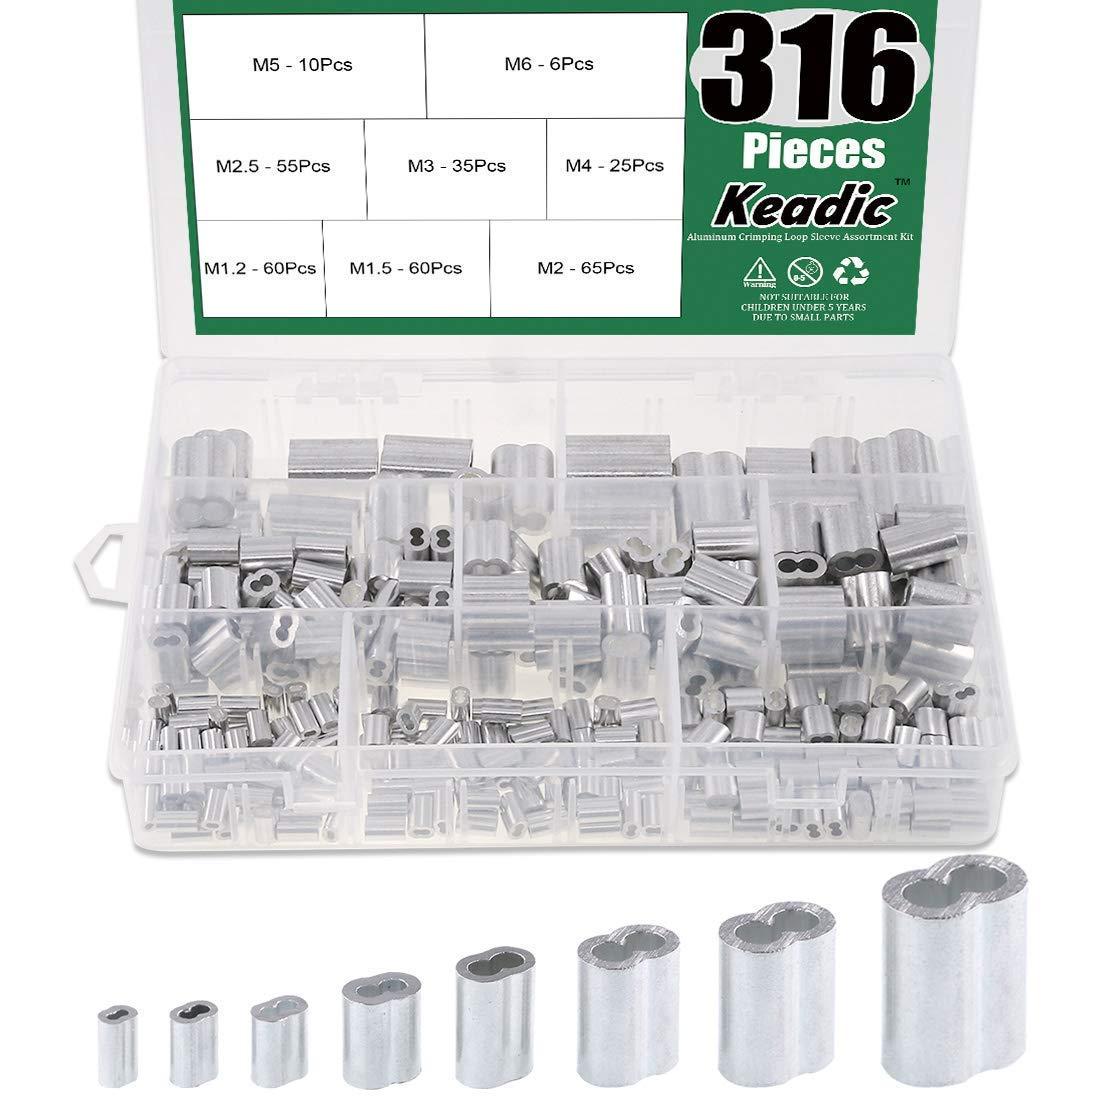 Keadic 316Pcs 8 Sizes Aluminum Crimping Loop Sleeve Metric Assortment Kit for Wire Rope Cable Rigging